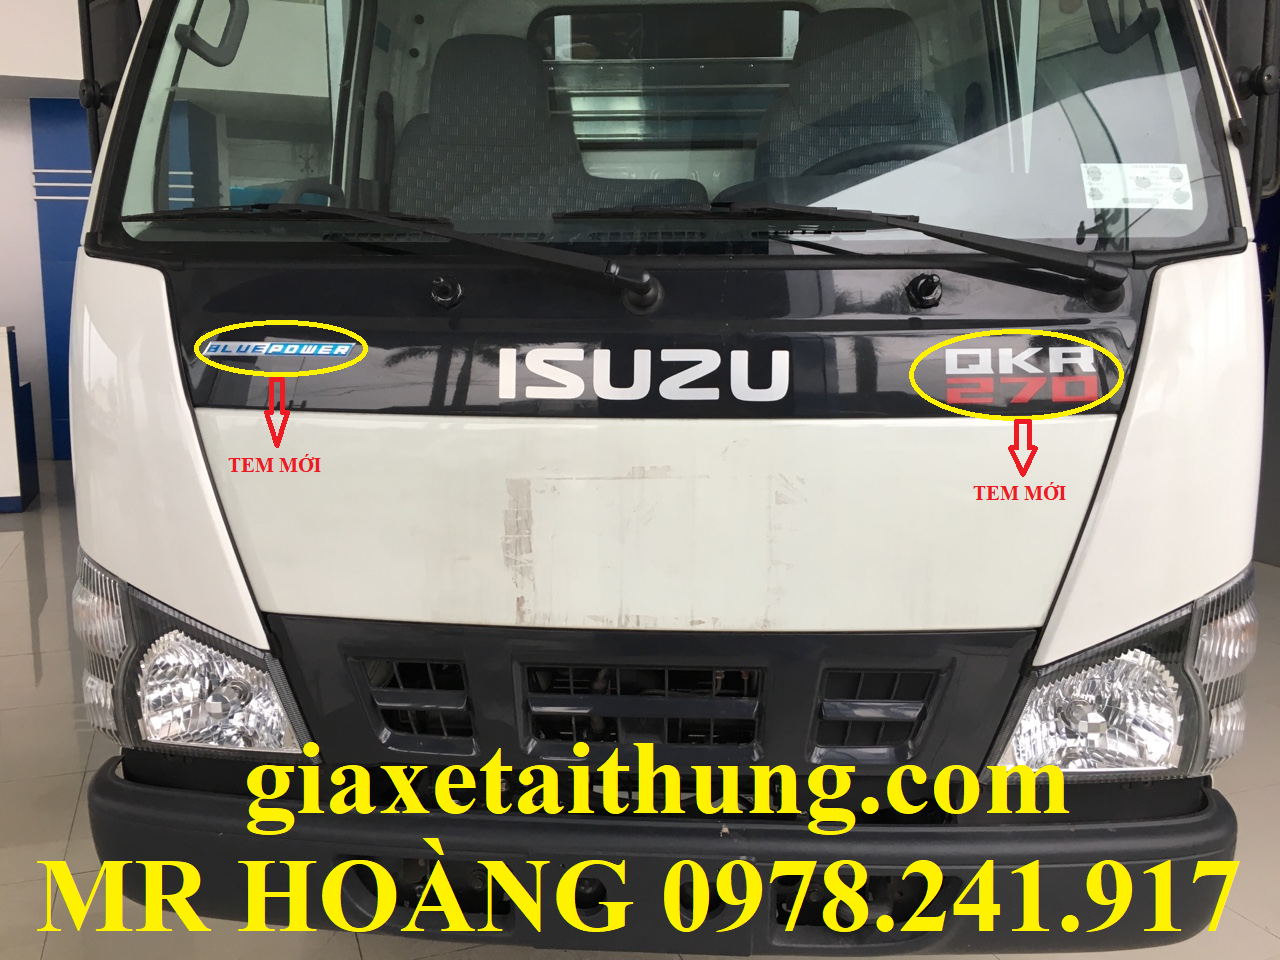 xe tải isuzu 1,1 tấn qkr77fe4, bộ tem cánh cửa 2